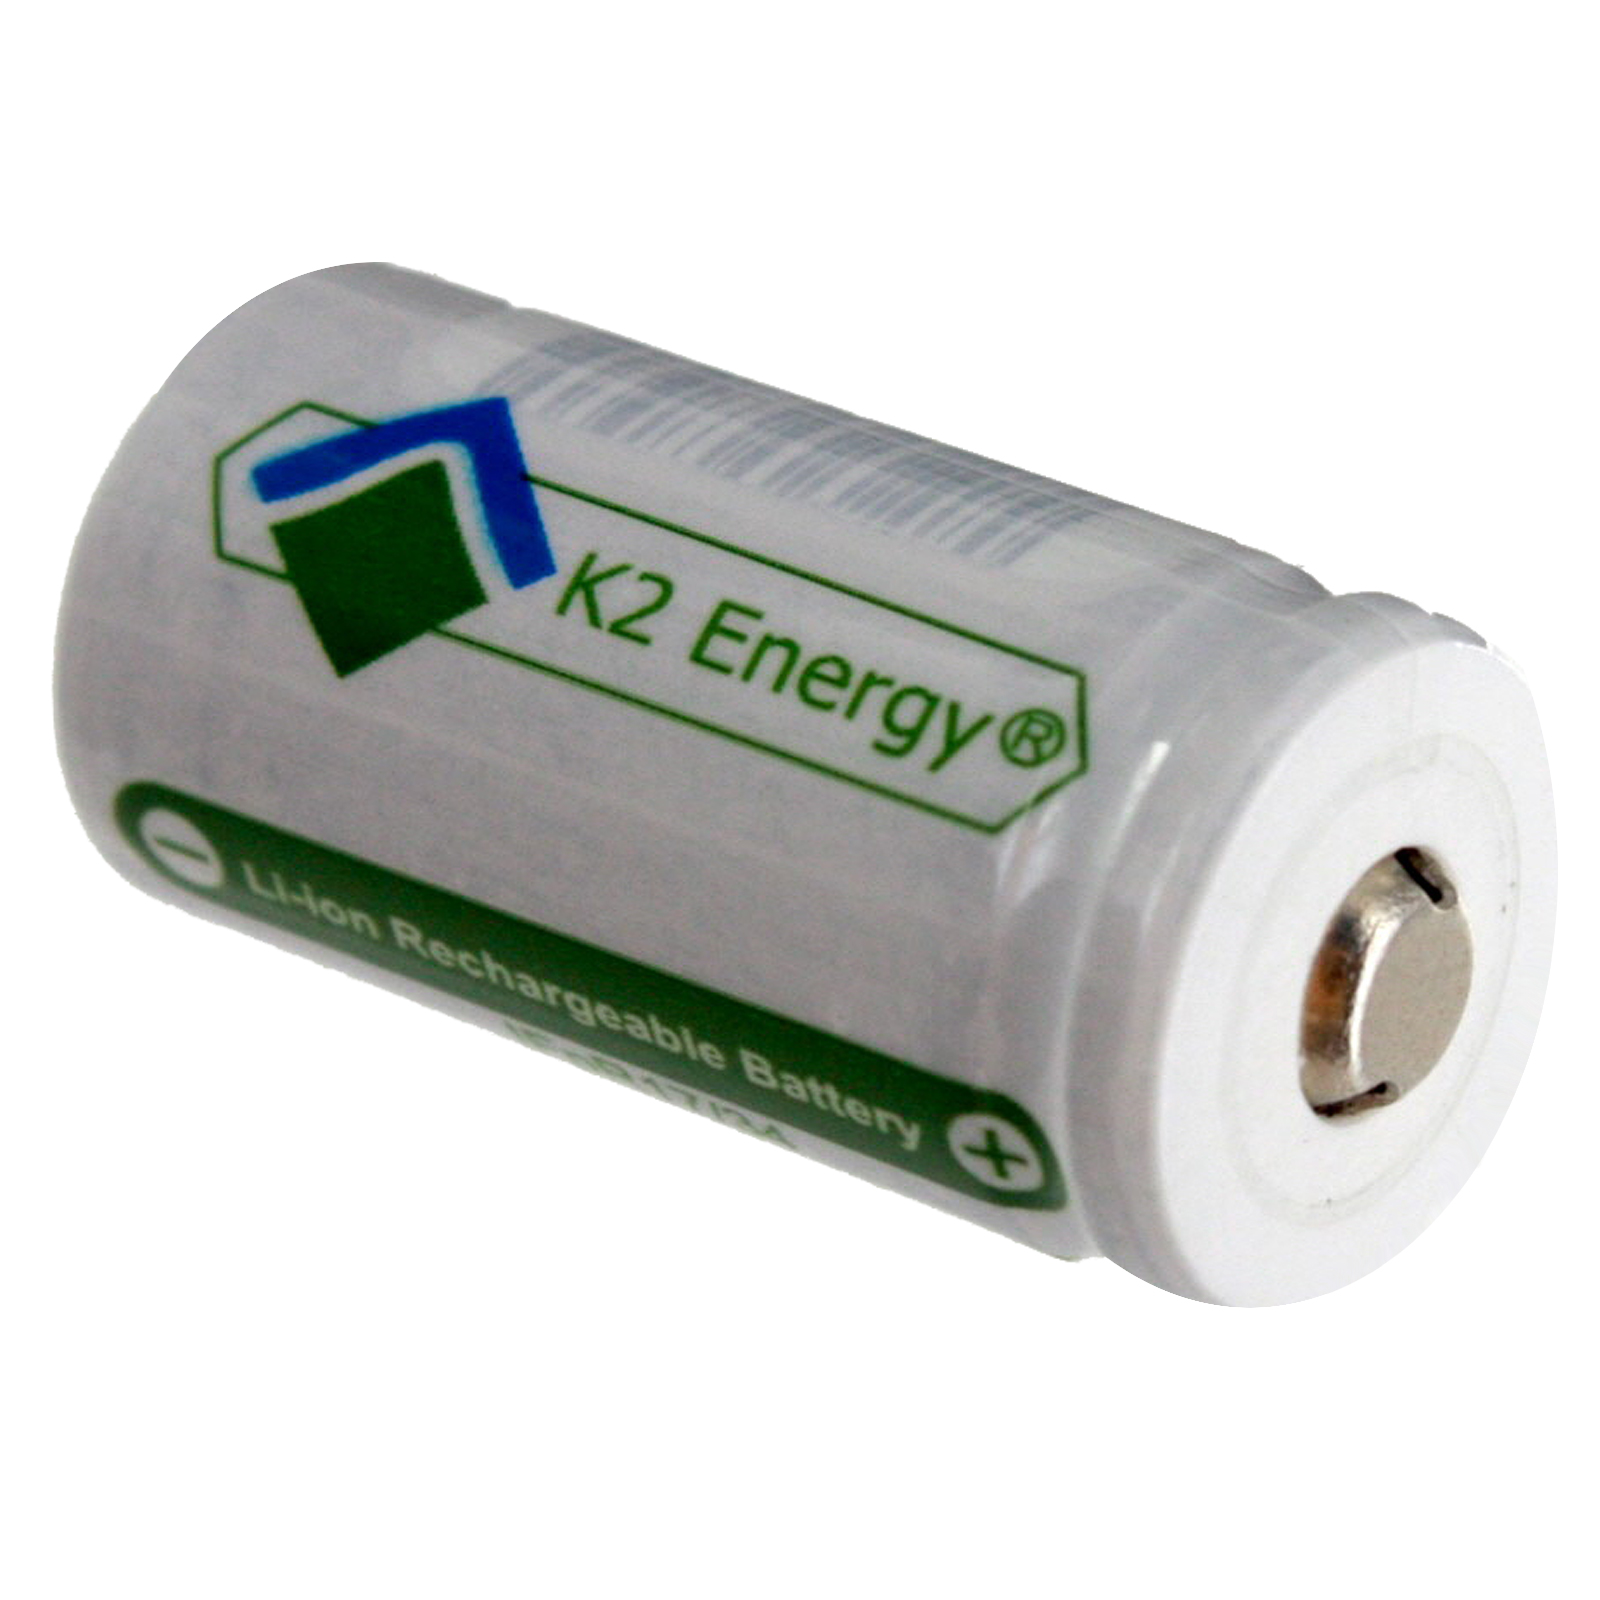 Rechargeable Batteries Ebay >> K2 Energy 3.2V LFP123A High Capacity Rechargeable Li-Ion Battery | eBay